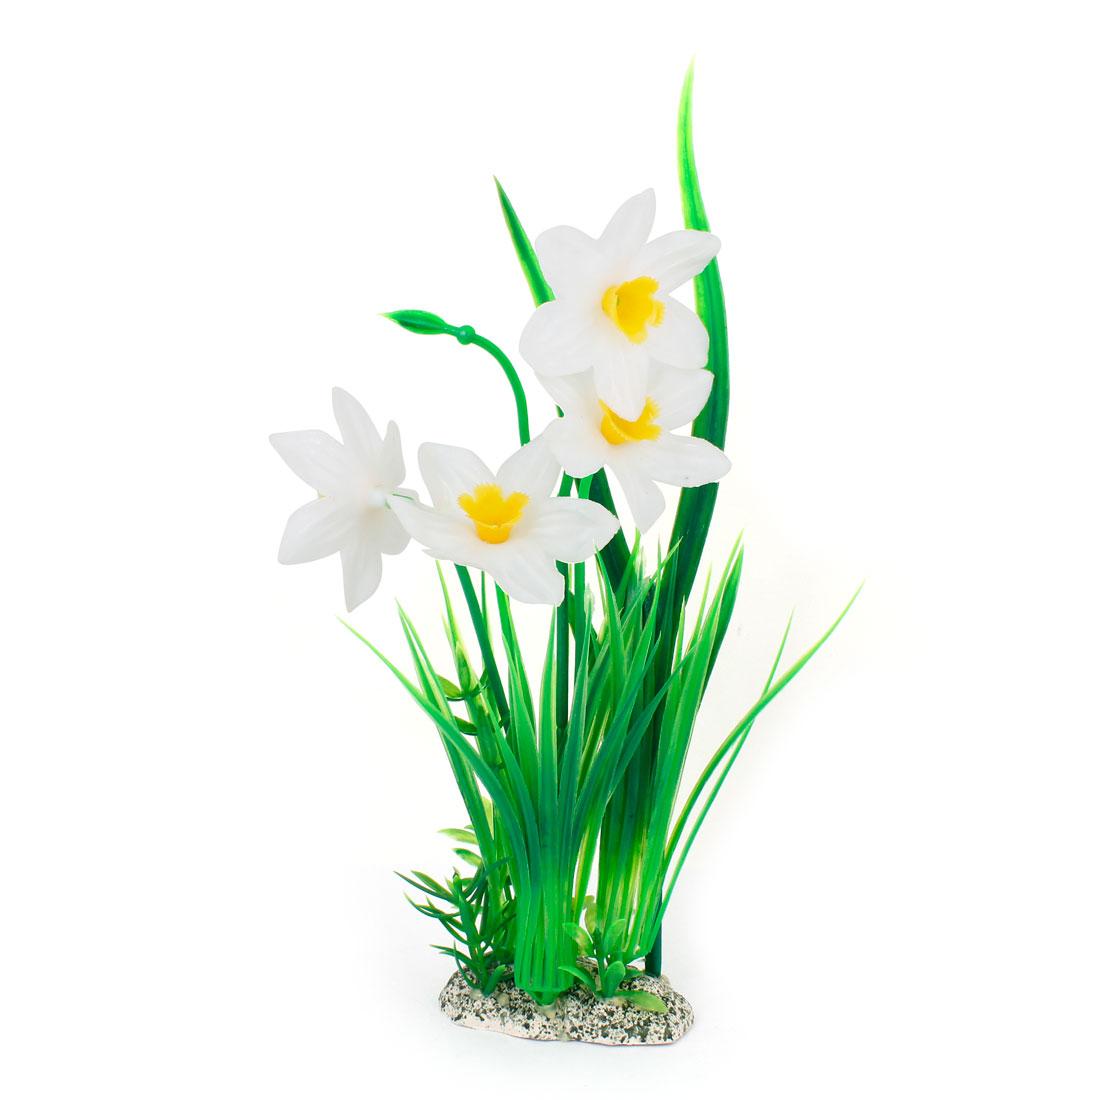 "Aquarium Manmade Aquatic Flower Plant Ornament 12.6"" Height Green White"